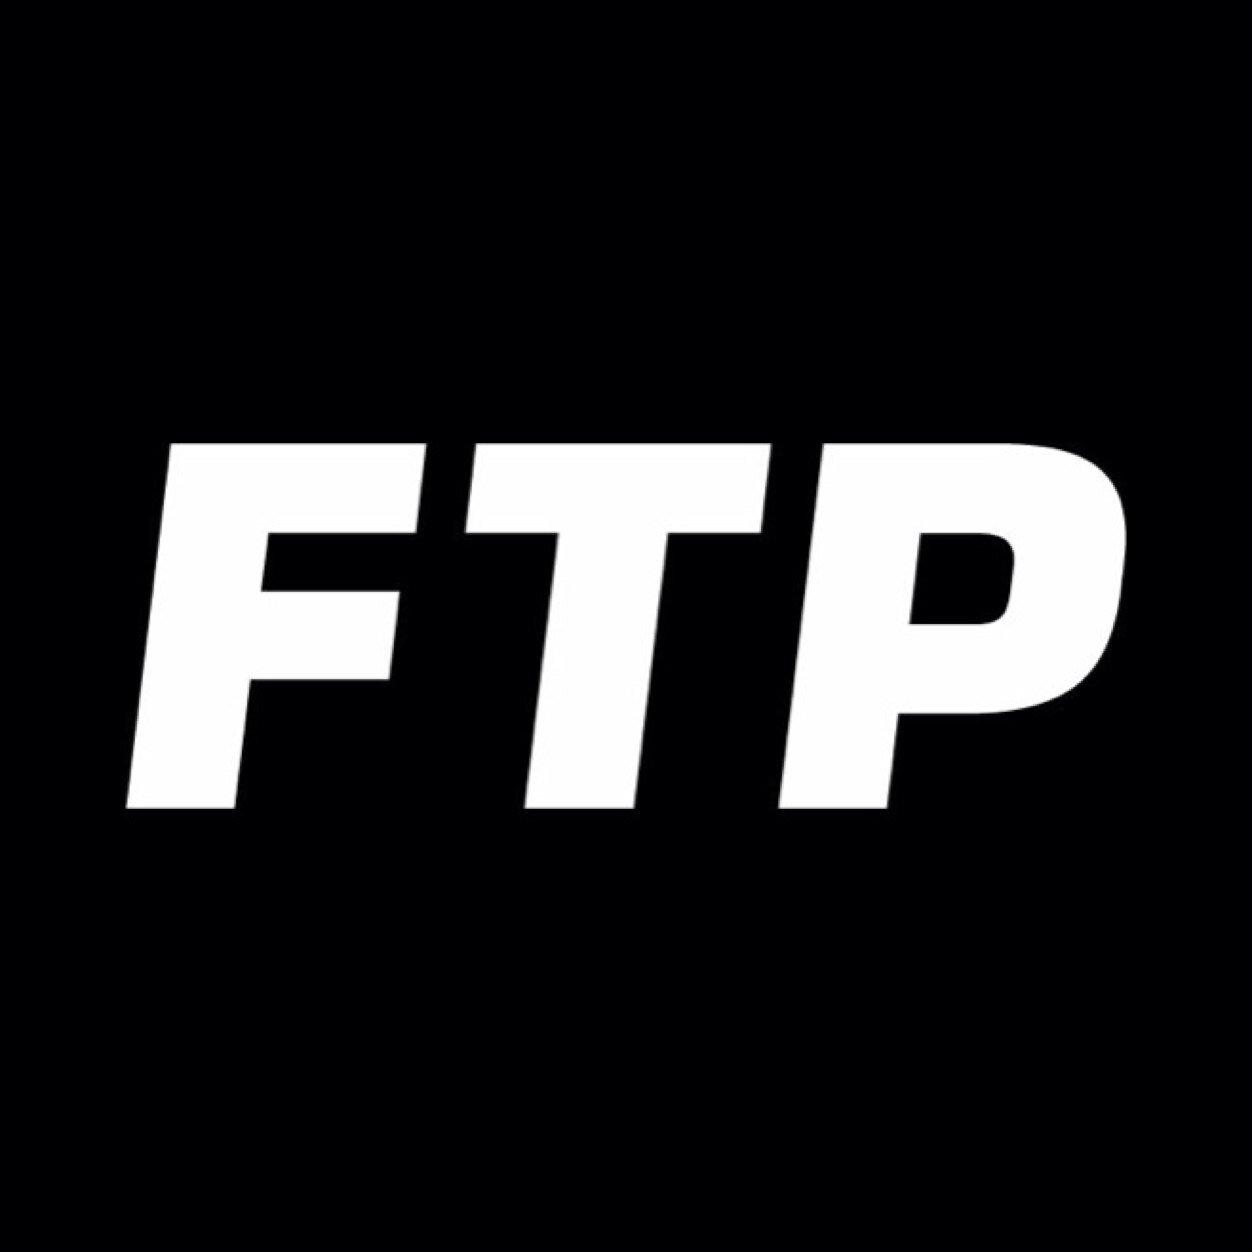 Cerberus FTP Server - An Easy to Configure FTP Server For Windows 7